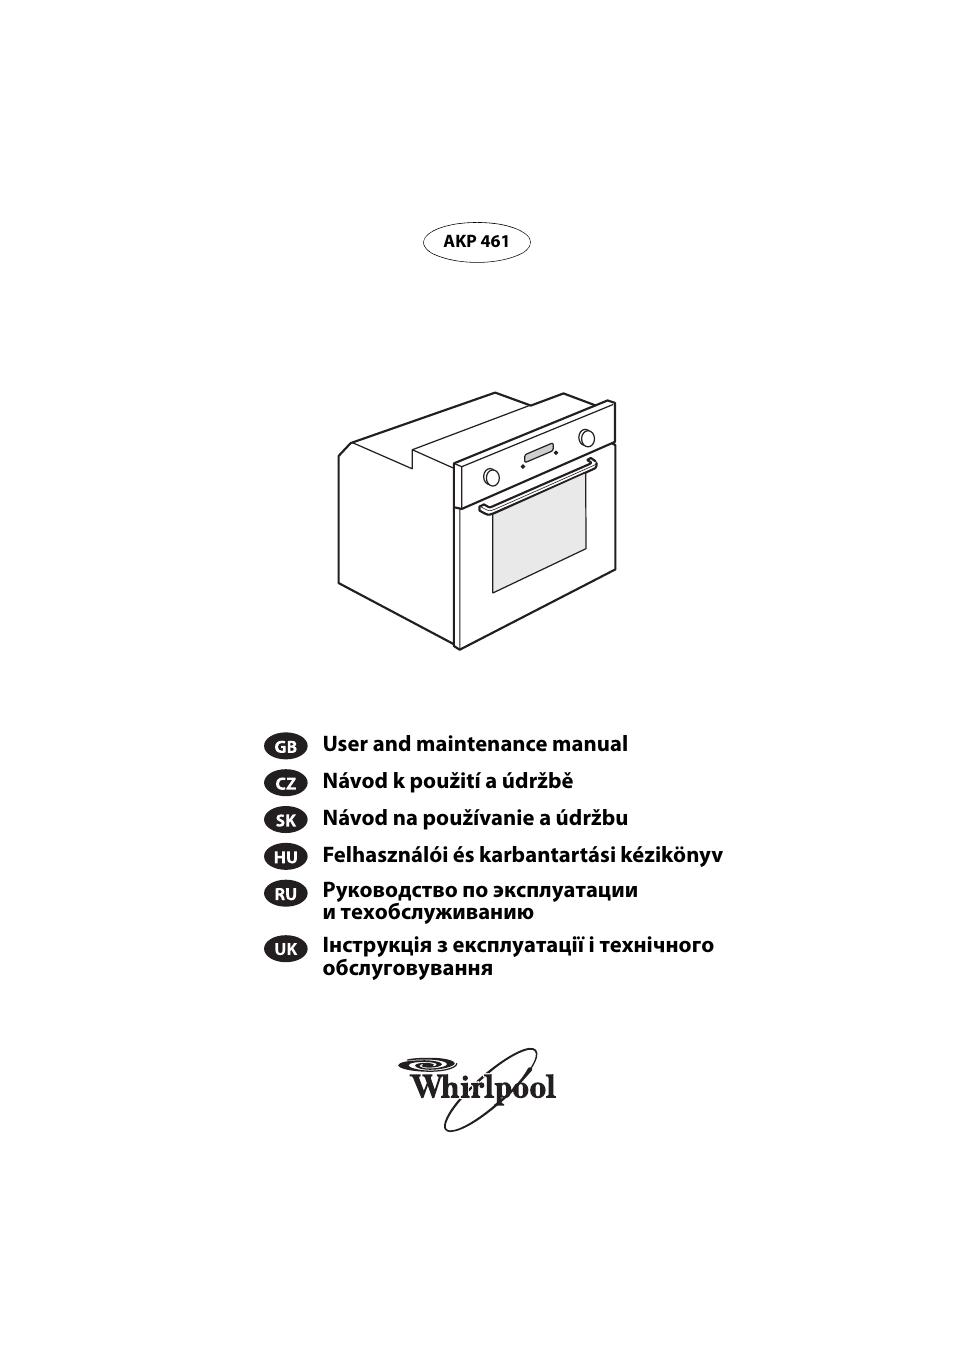 Whirlpool Akp 461 Wh User Manual